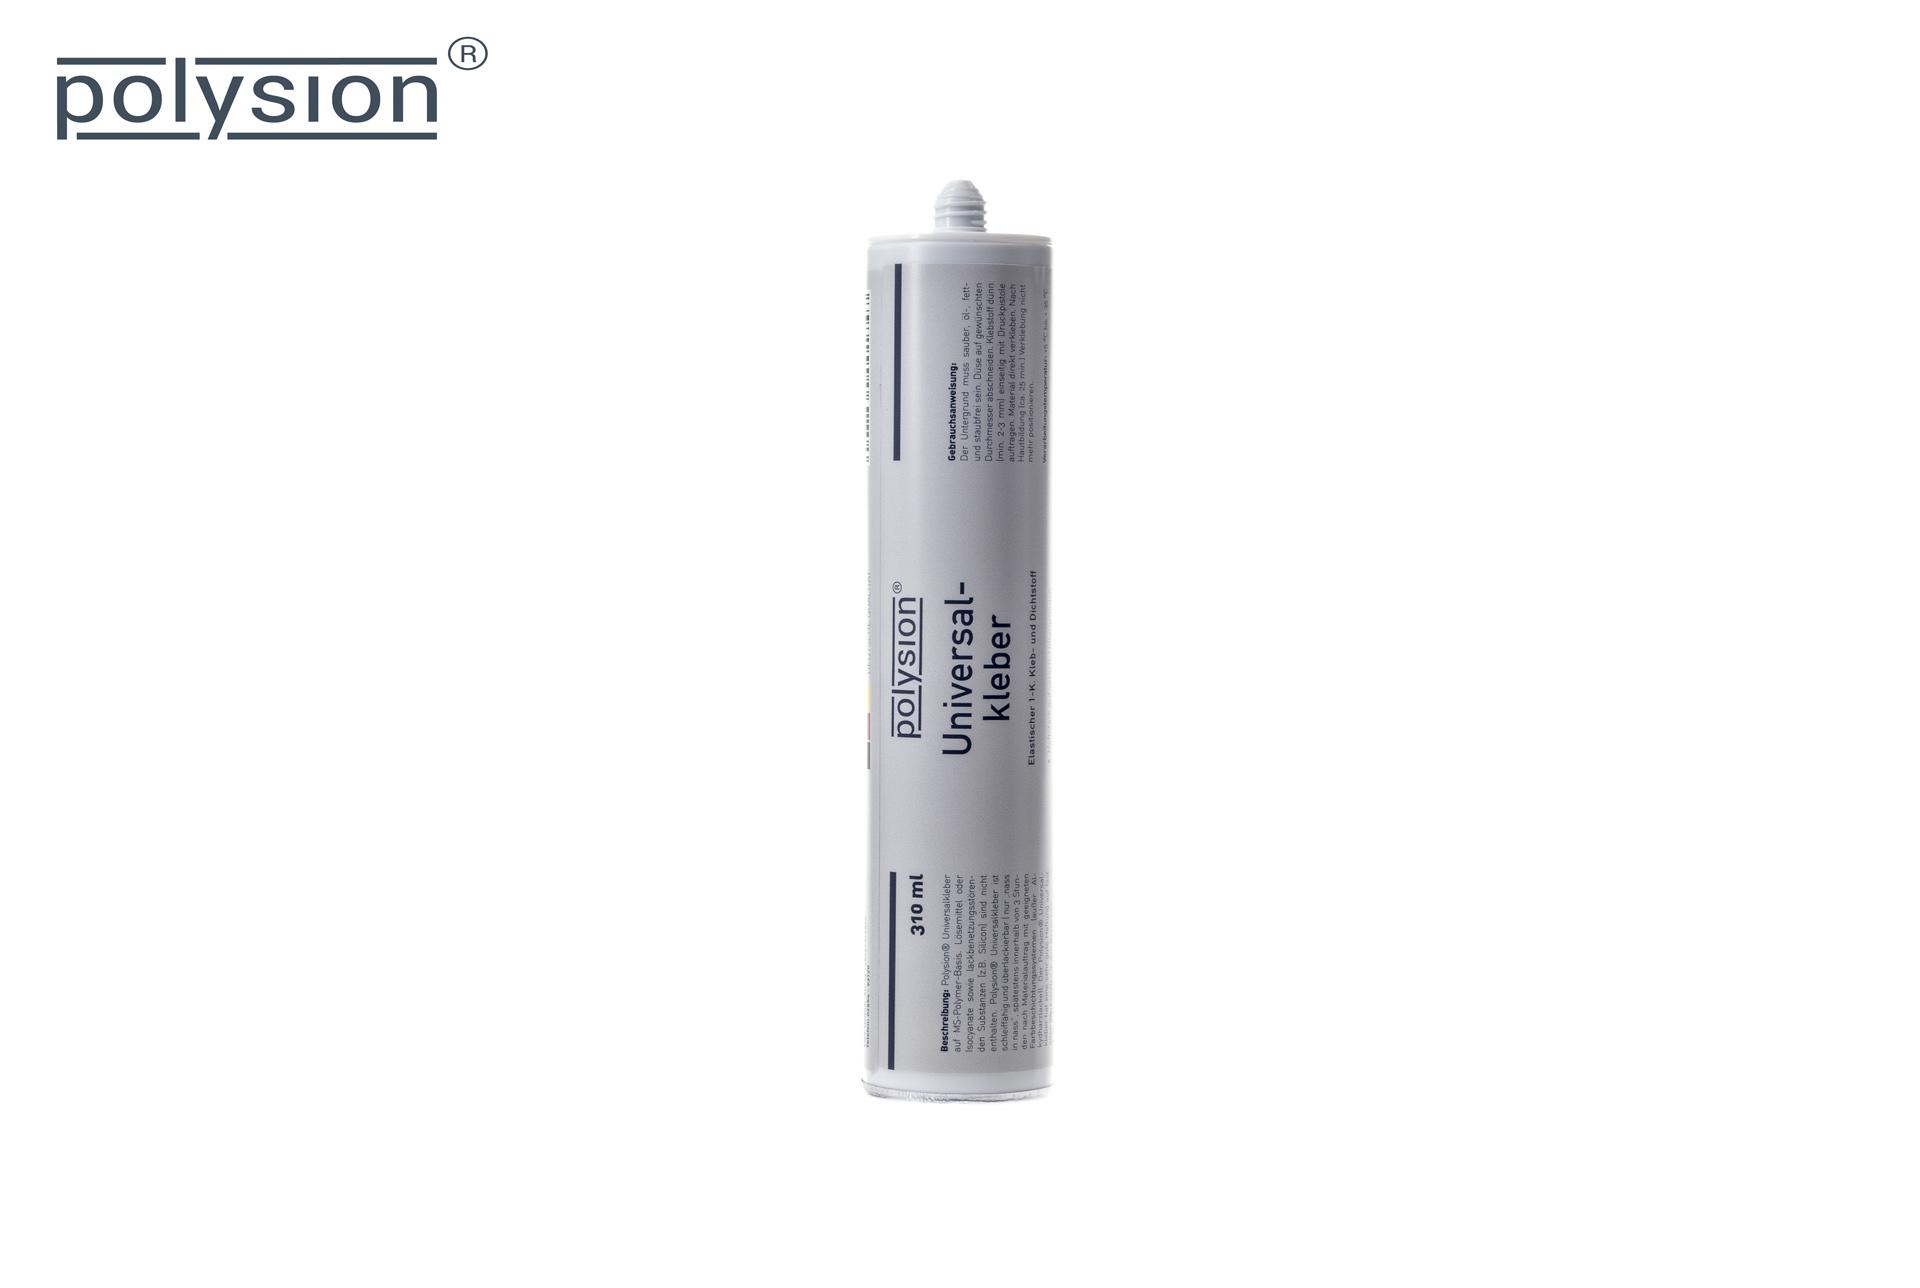 Polysion®Universalkleber, 310 ml - Grundpreis: 5,13€/100ml